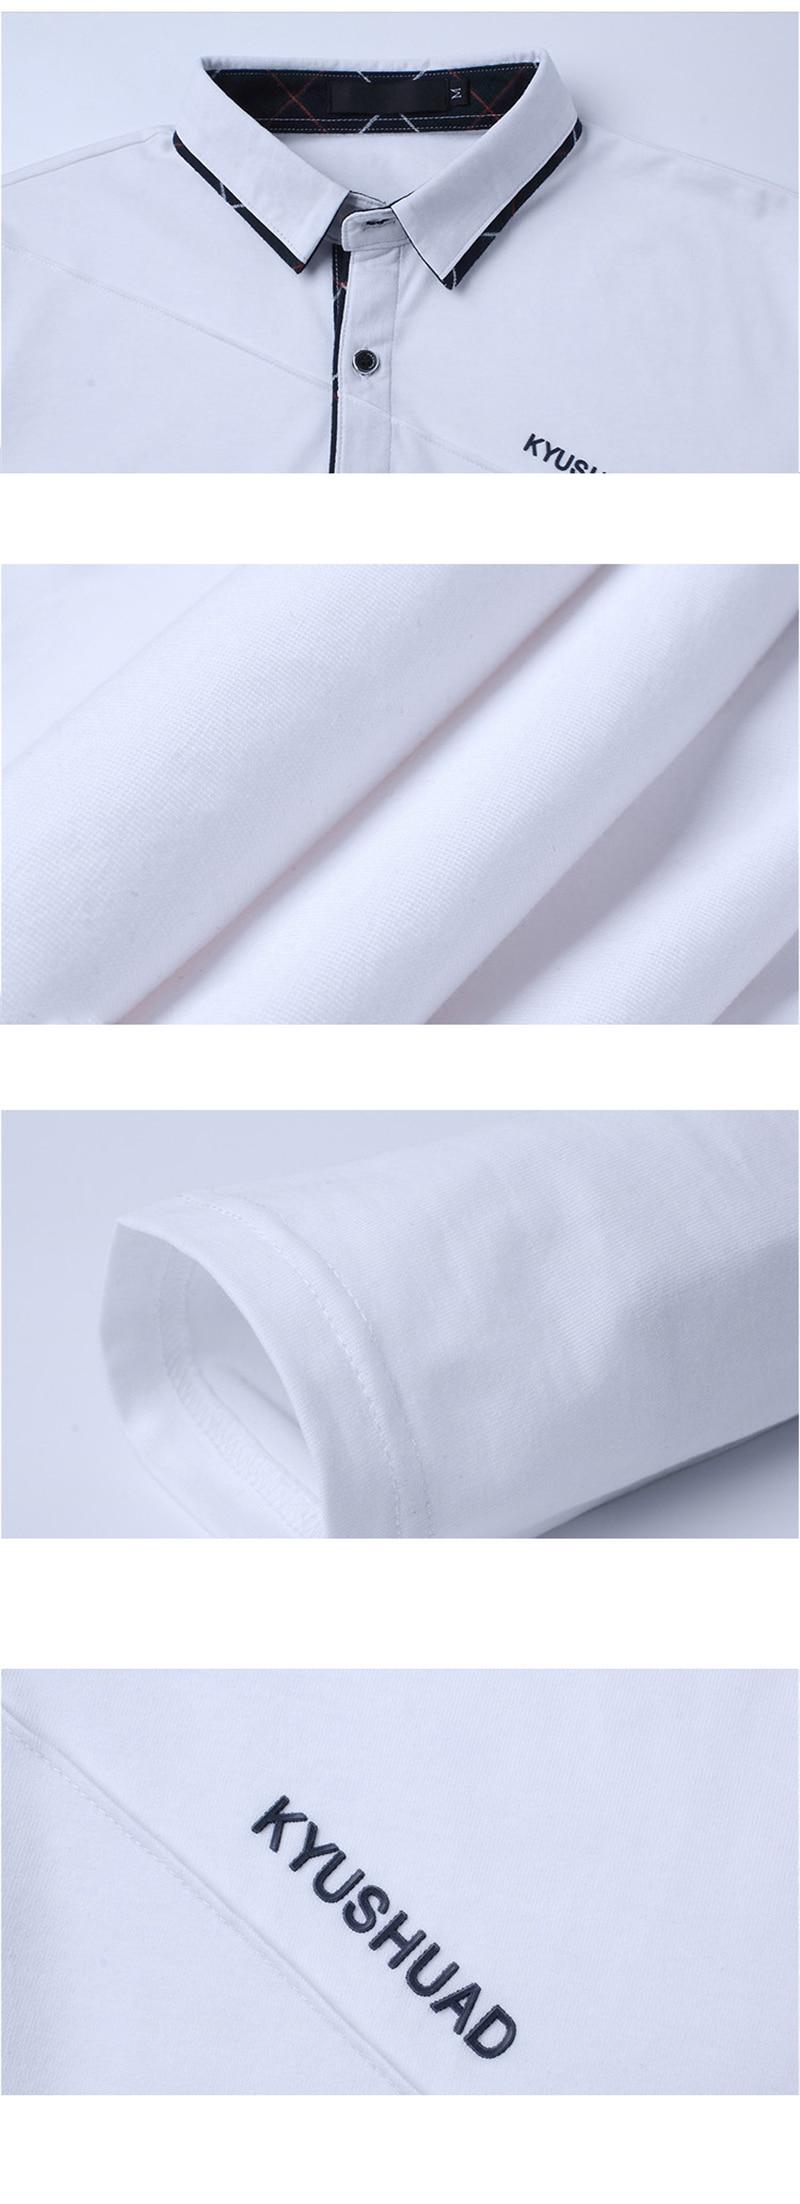 HTB1ZSKZatfvK1RjSszhq6AcGFXae 5XL Polo Shirt Collar Men Plus Size 3XL 4XL Autumn Button Brand Men Polo Shirt Long Sleeve Casual Male Shirt Dress Polo Shirts